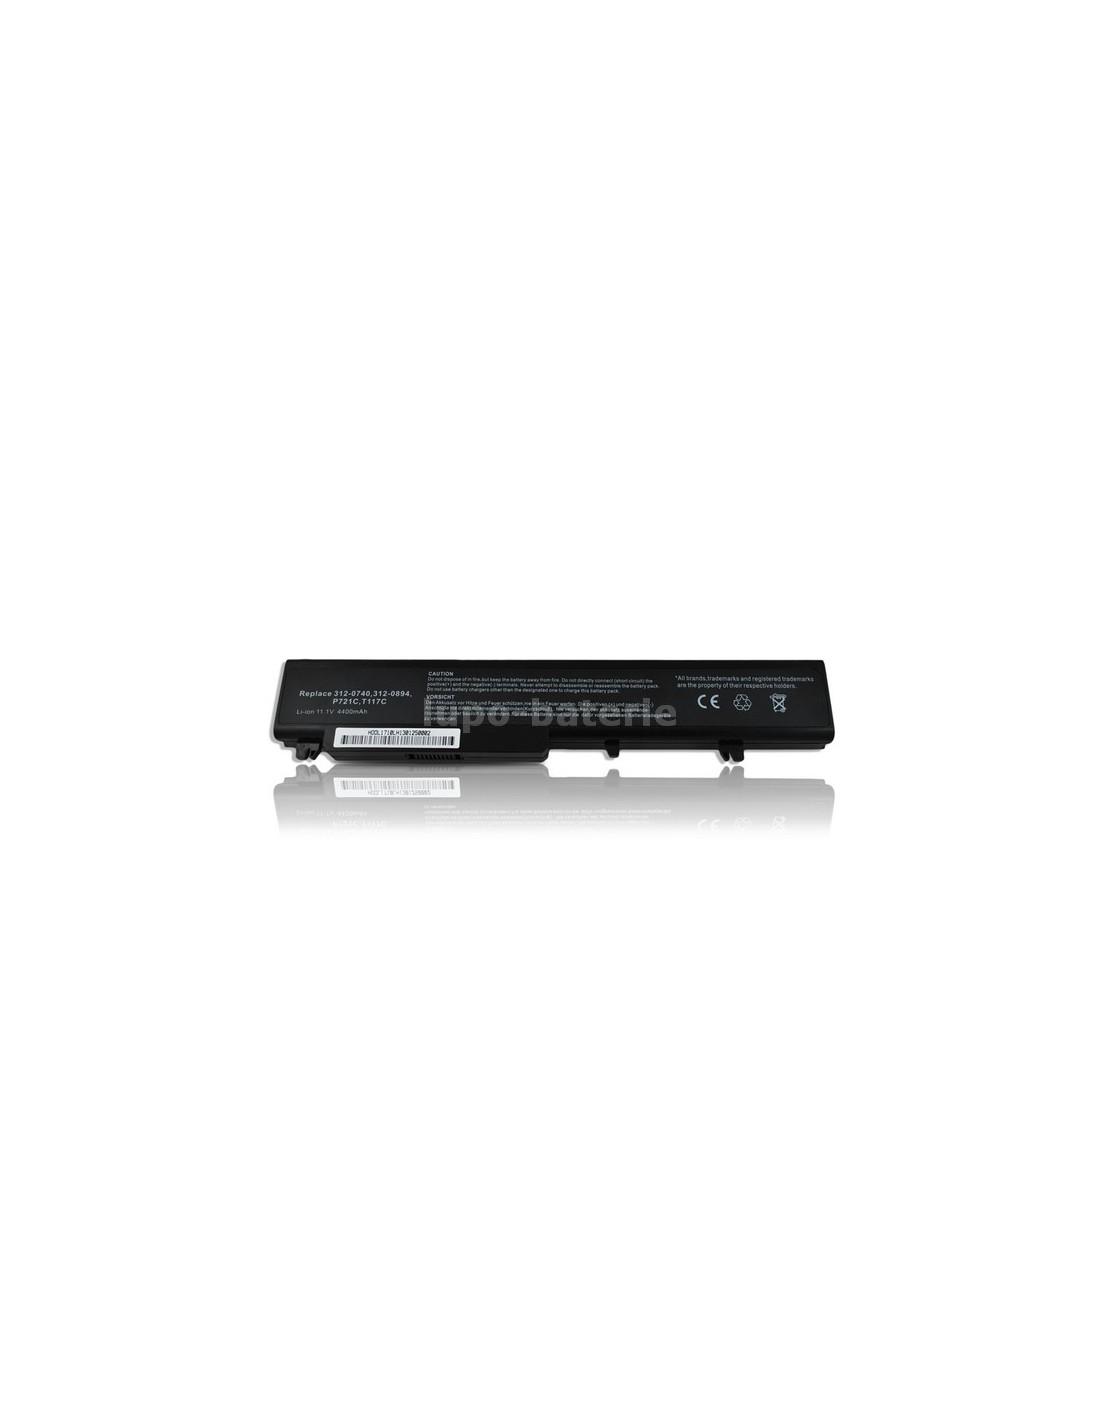 akumulator do laptopa dell vostro 1710 4400mah 10 8v. Black Bedroom Furniture Sets. Home Design Ideas